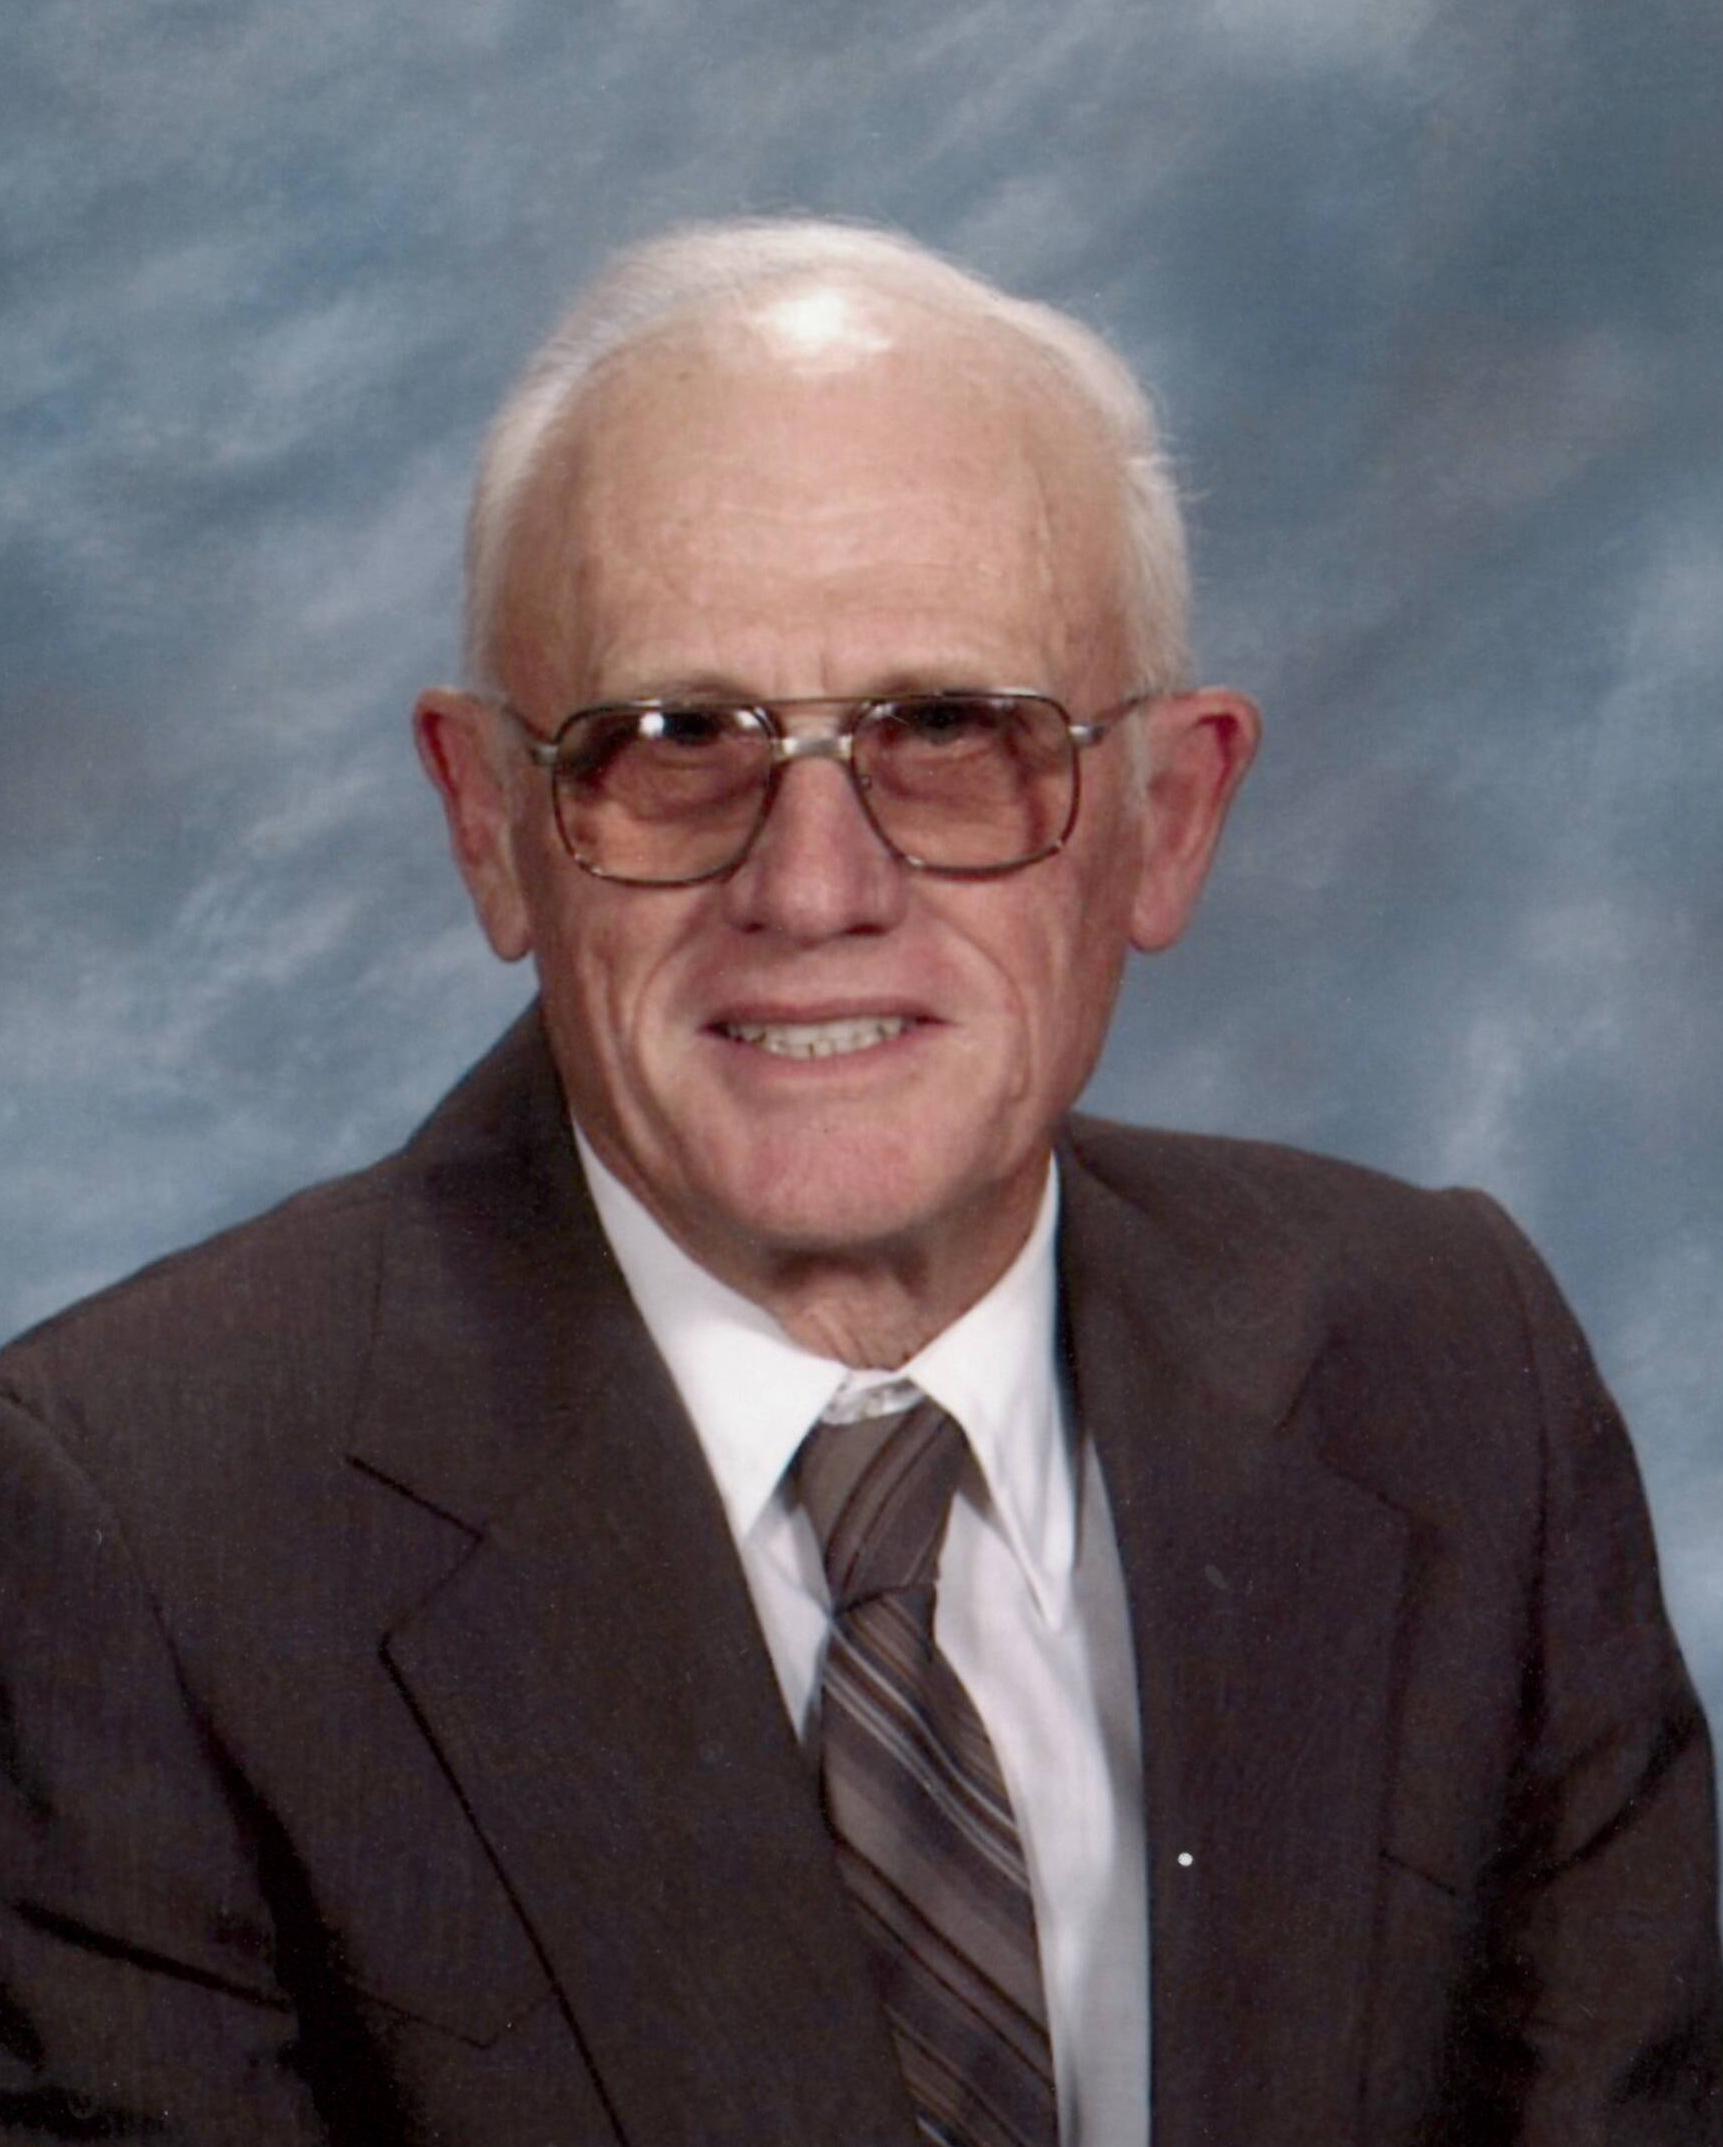 Edward Donald Rebman, 85 years of age, of Alma